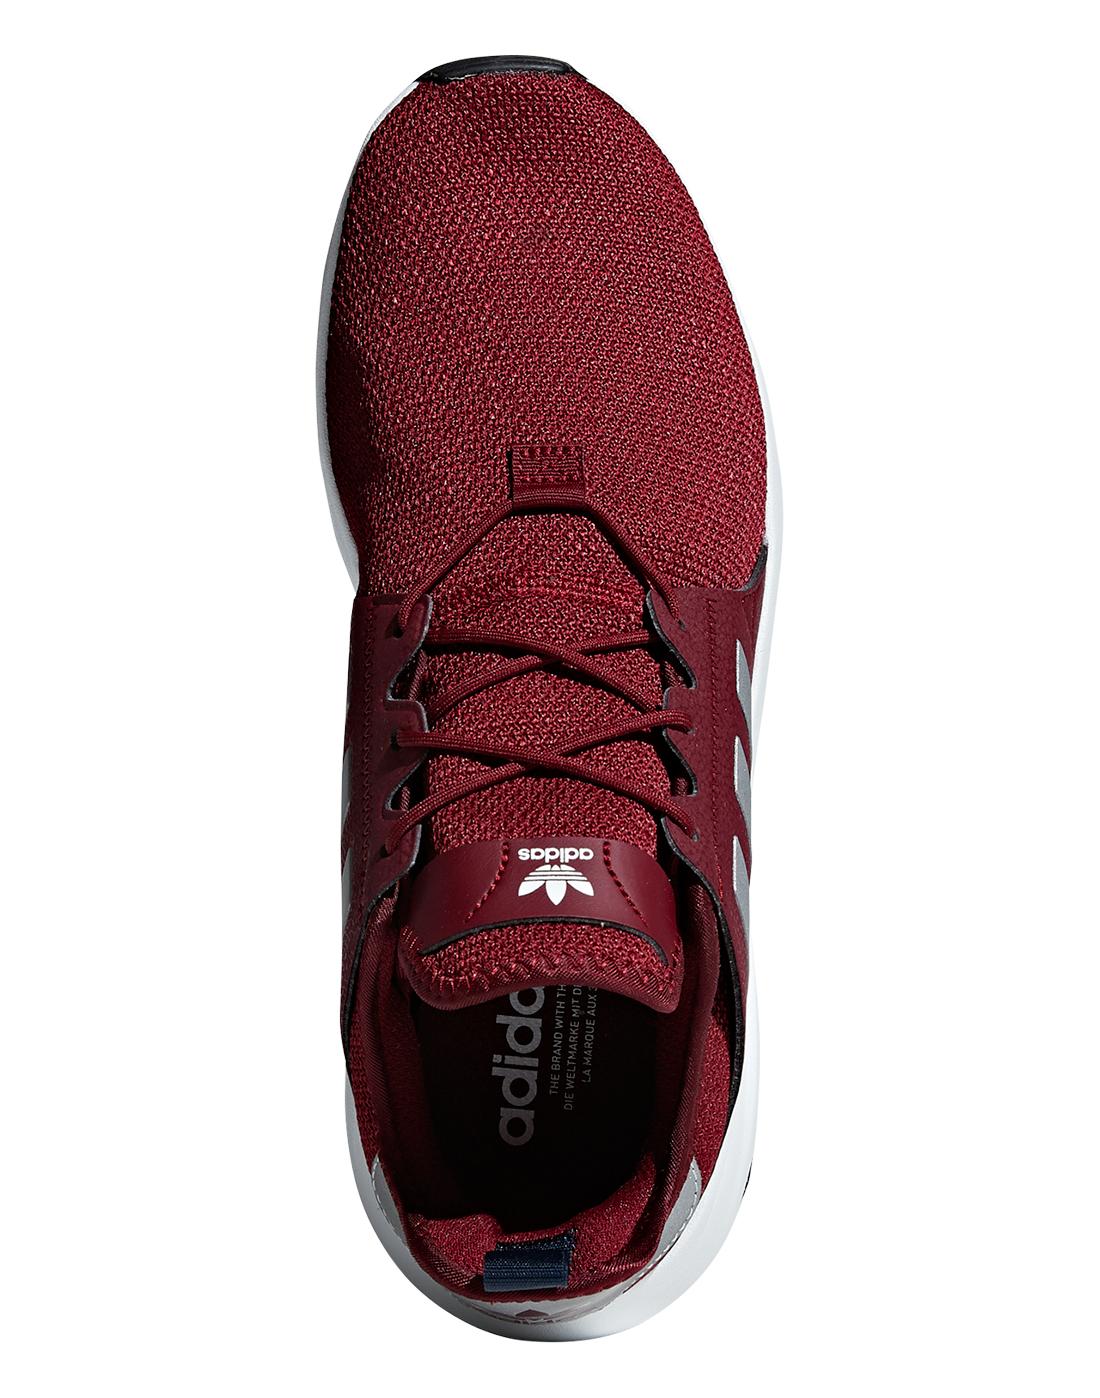 01be7f5f92c2 Men s Burgundy adidas Originals XPLR